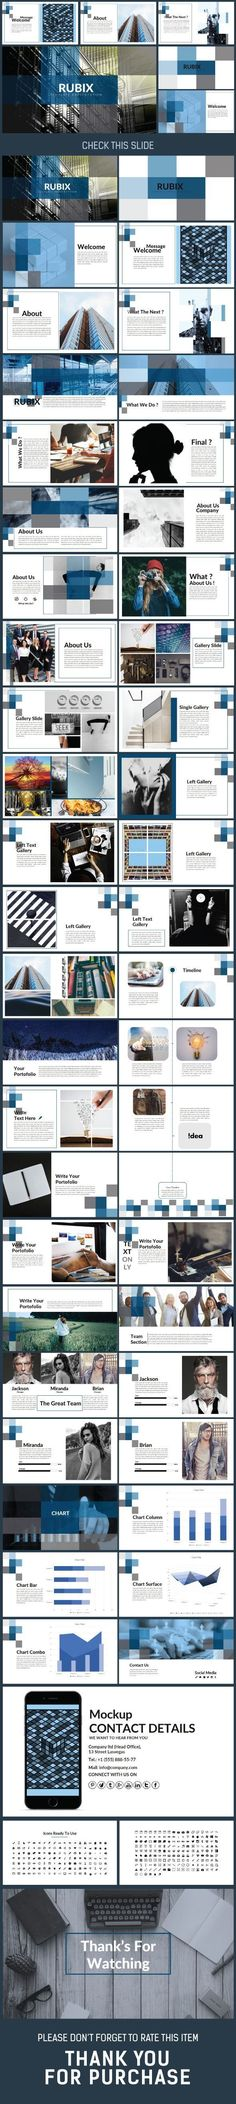 Business infographic : Business infographic : RUBIX Presentation Power Point Template Creative PowerPo